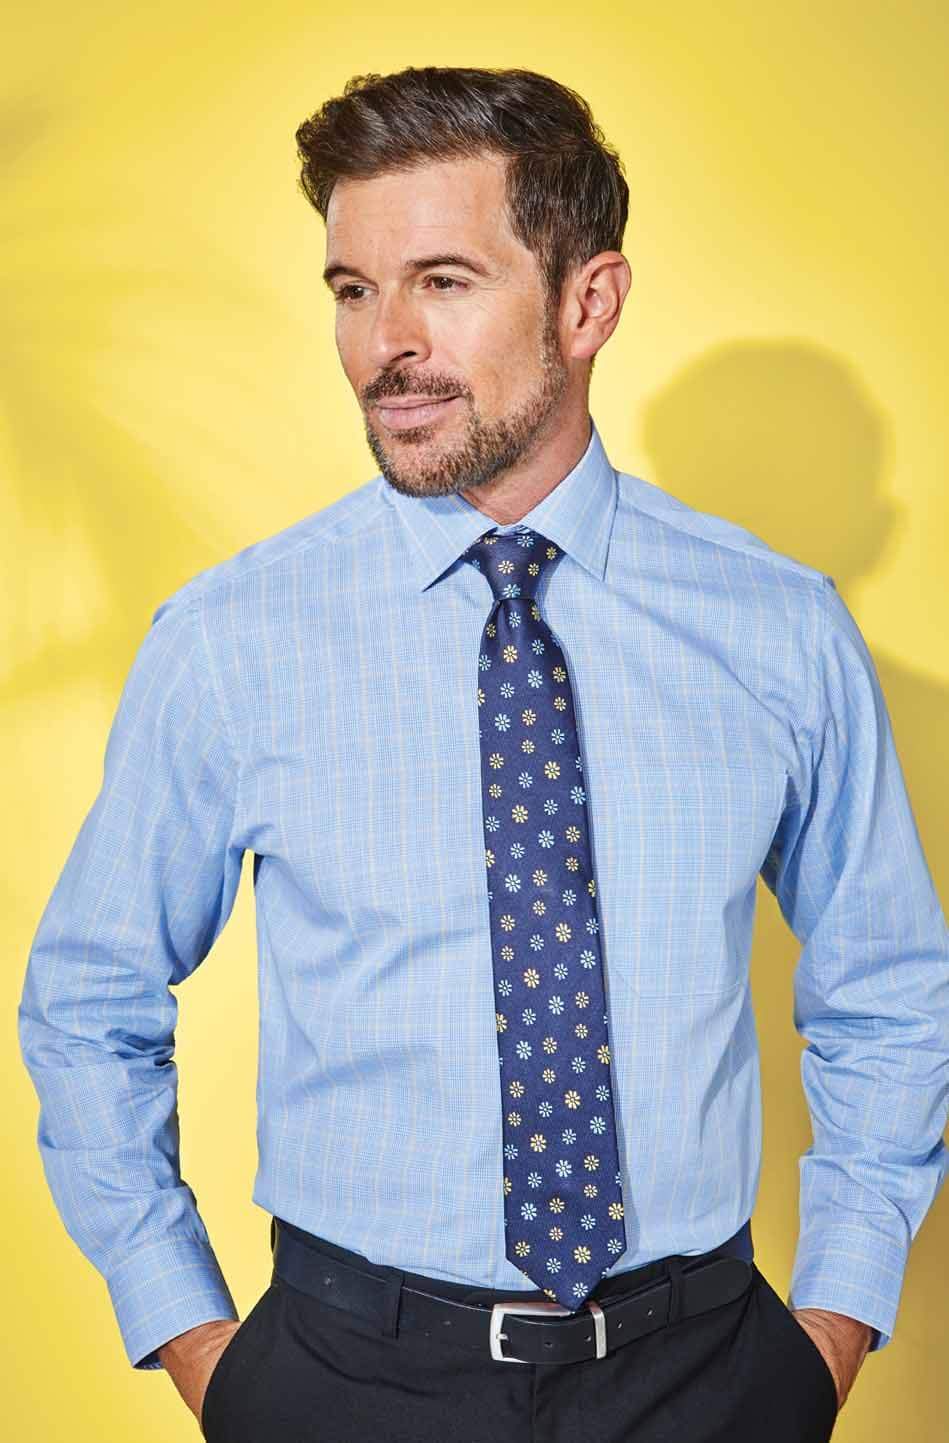 Shop Men's Patterned Formal Shirts fit for a Royal Weding